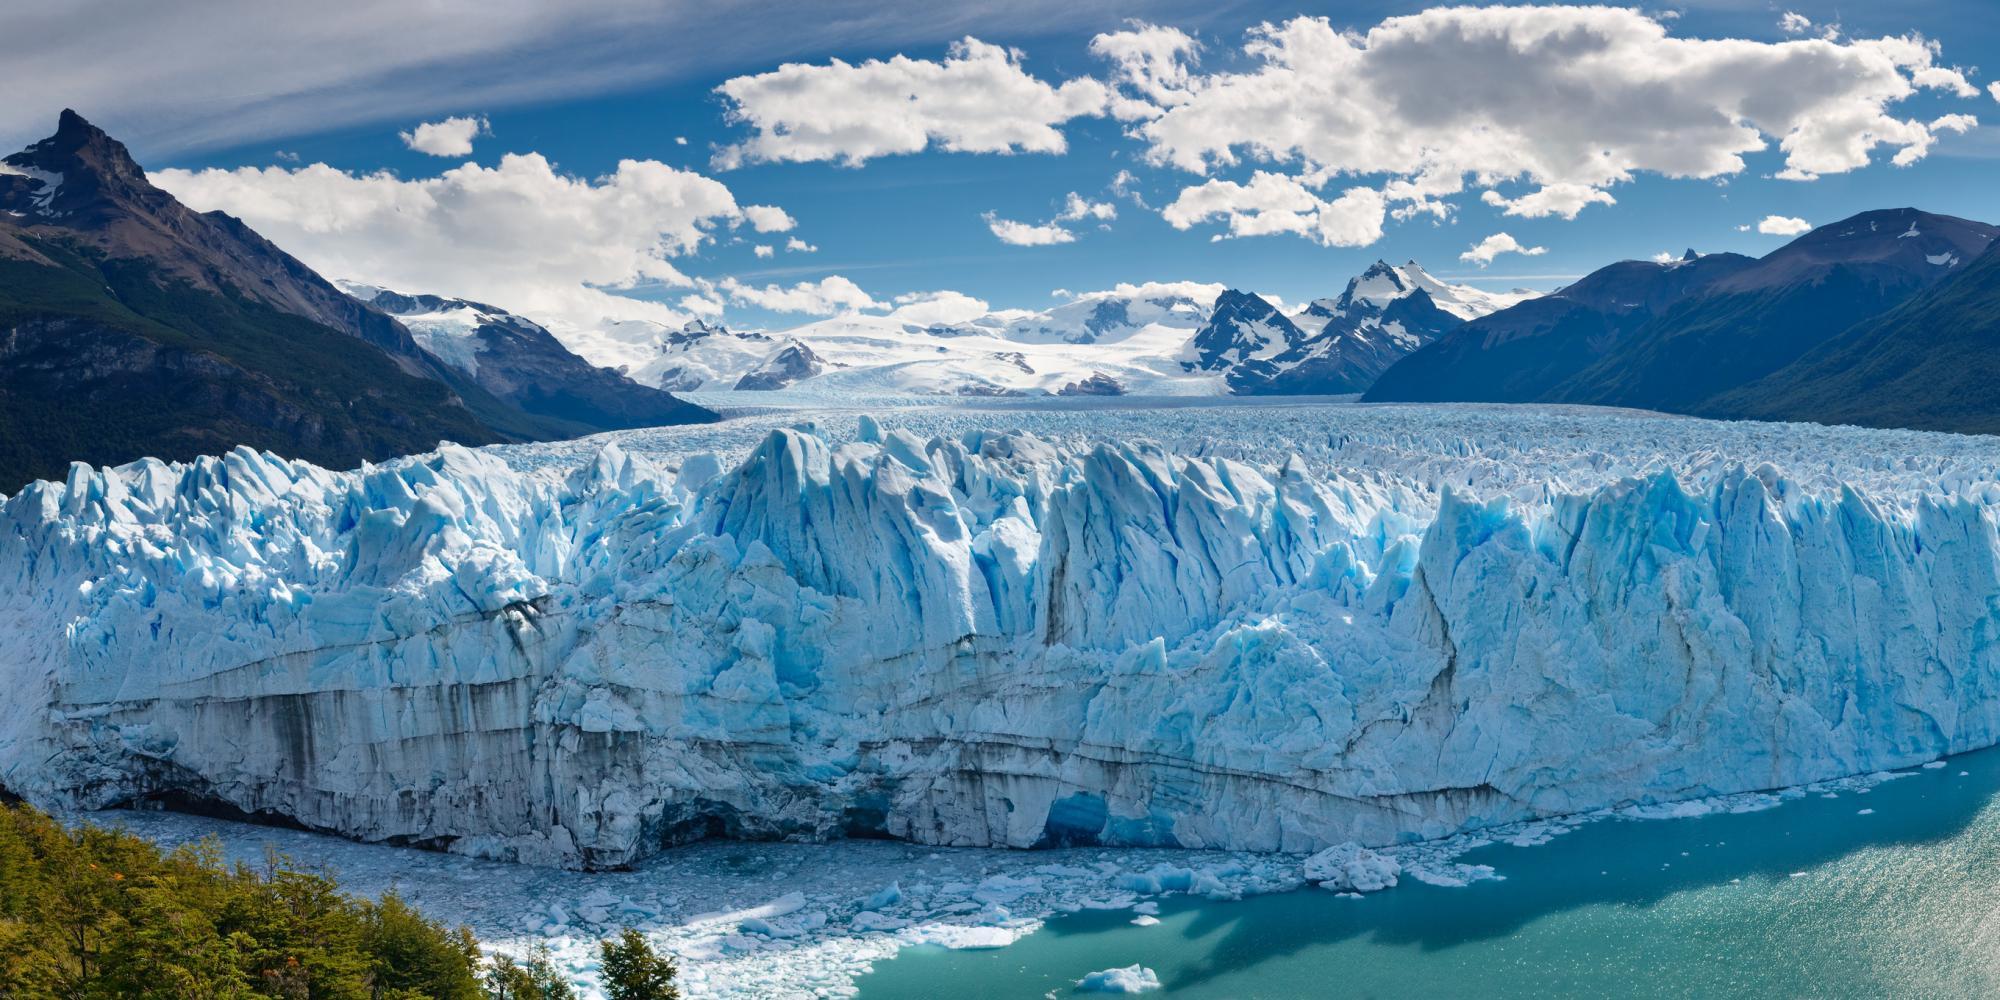 Argentina_Patagonia_Tour_Perito_Moreno_Glacier_-_lost_world_adventures_1